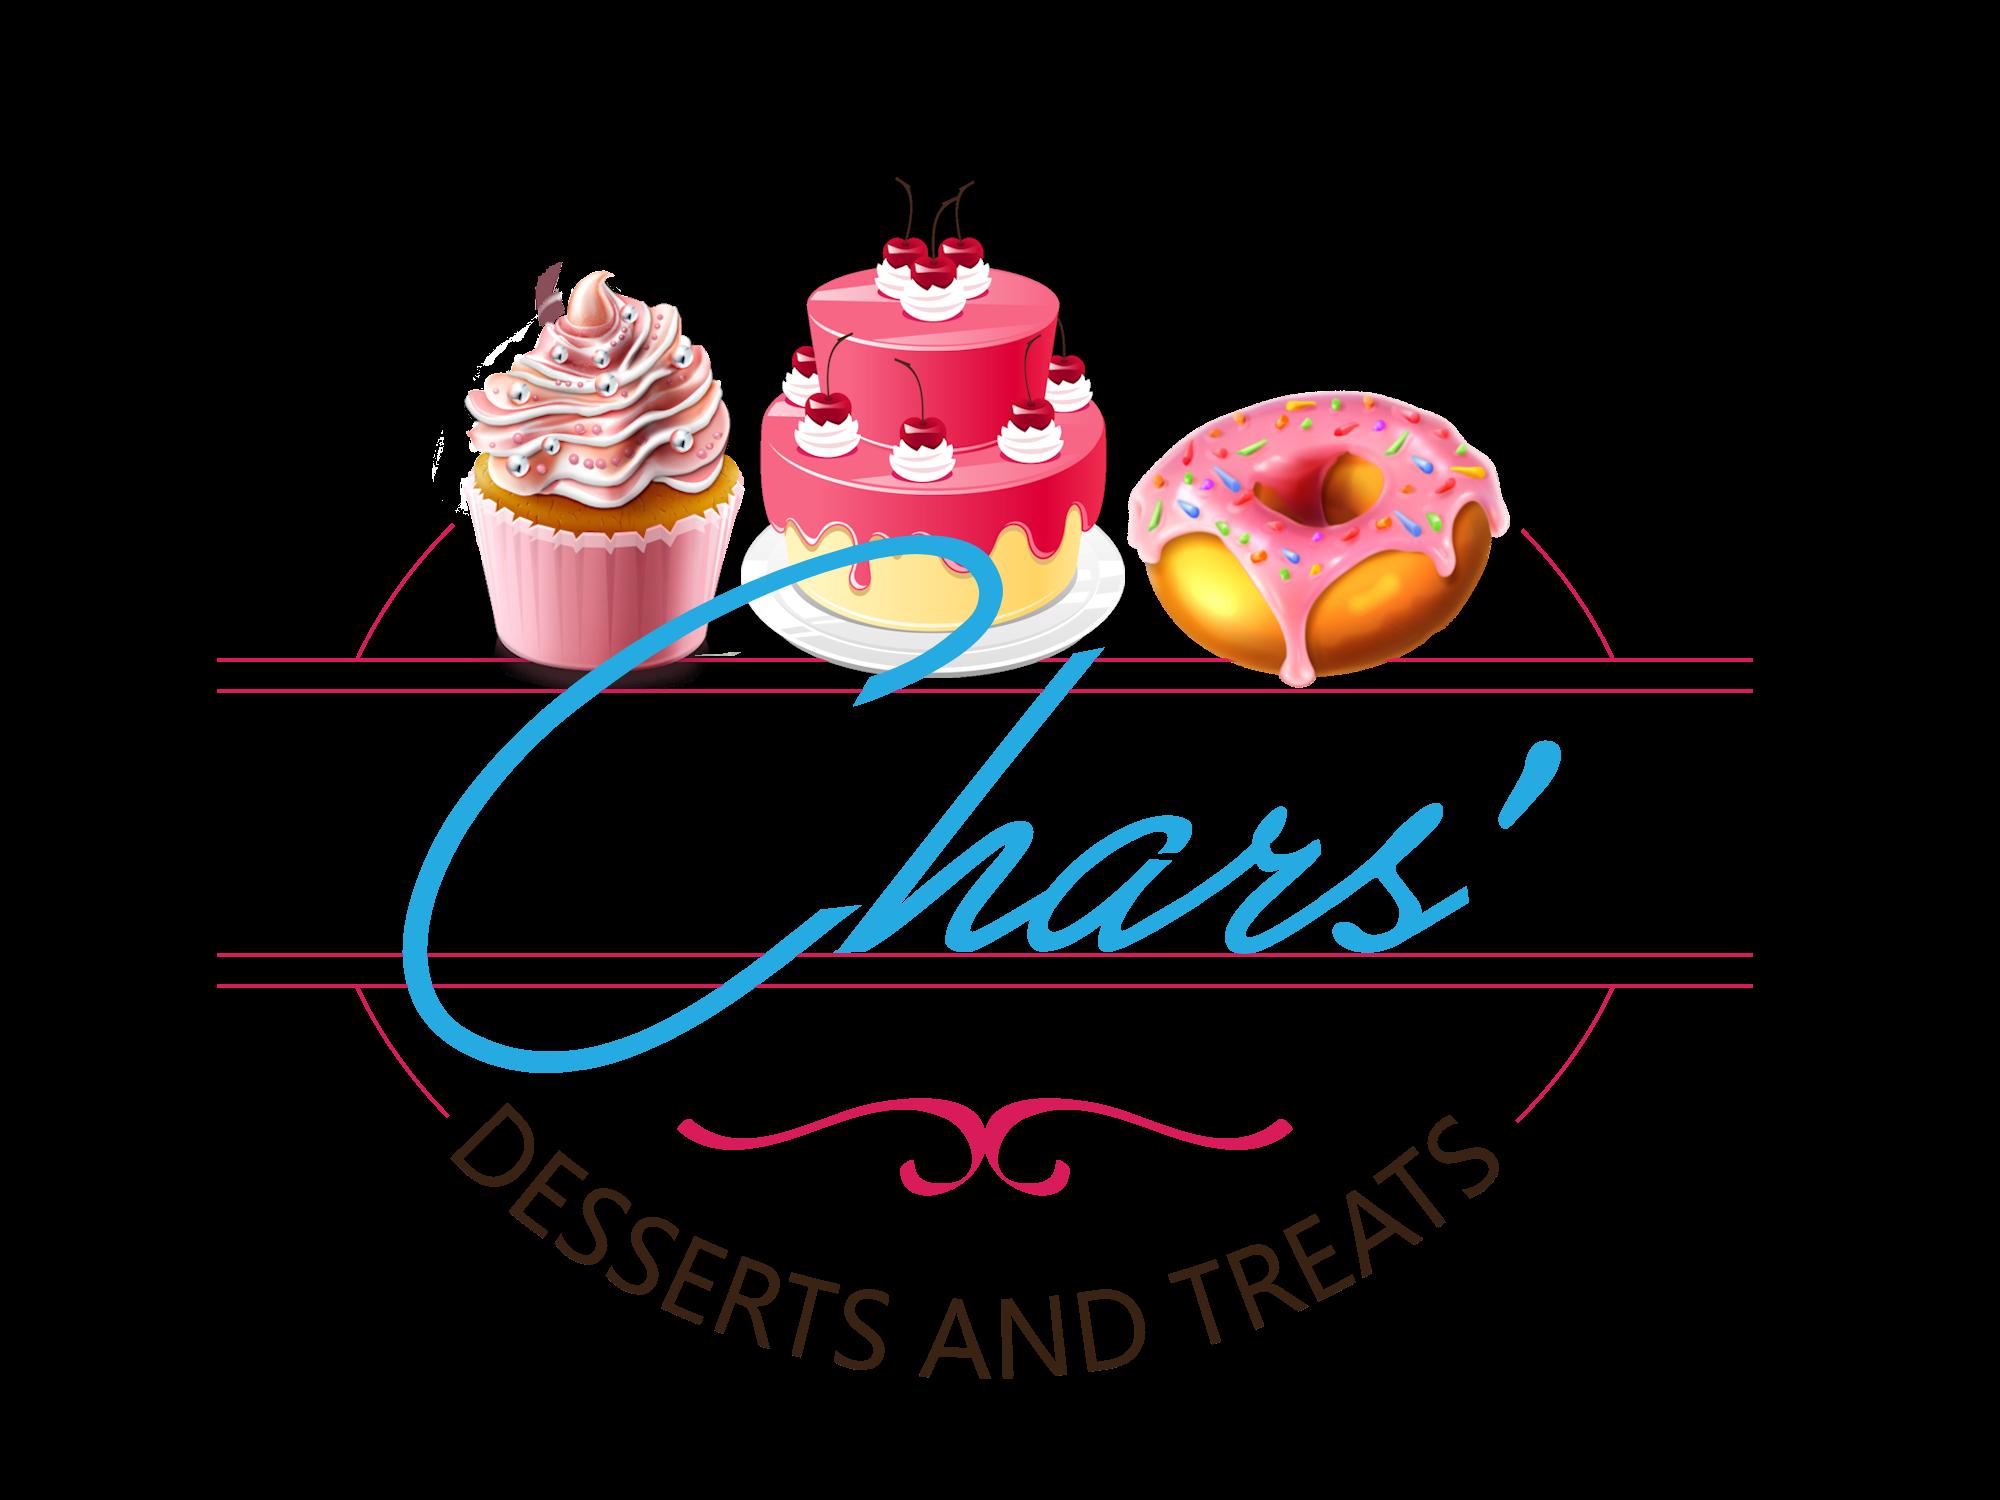 Chars'Dessertsandtreats